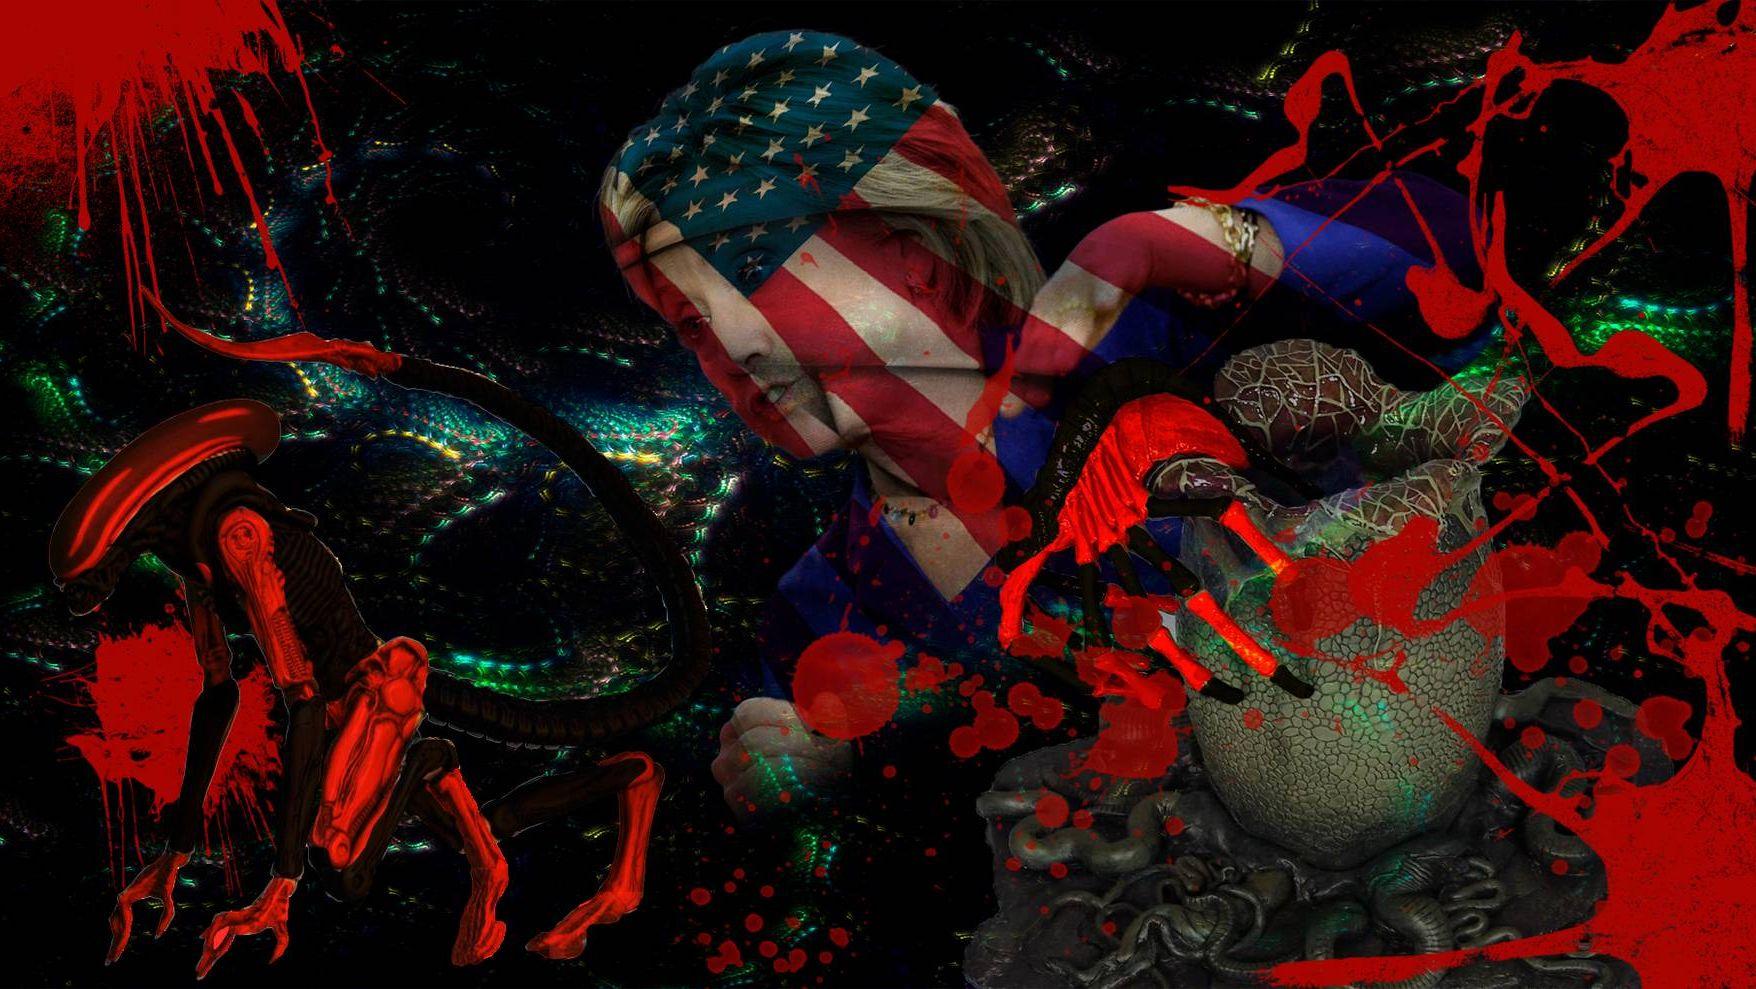 США воспроизводит бандеровцев